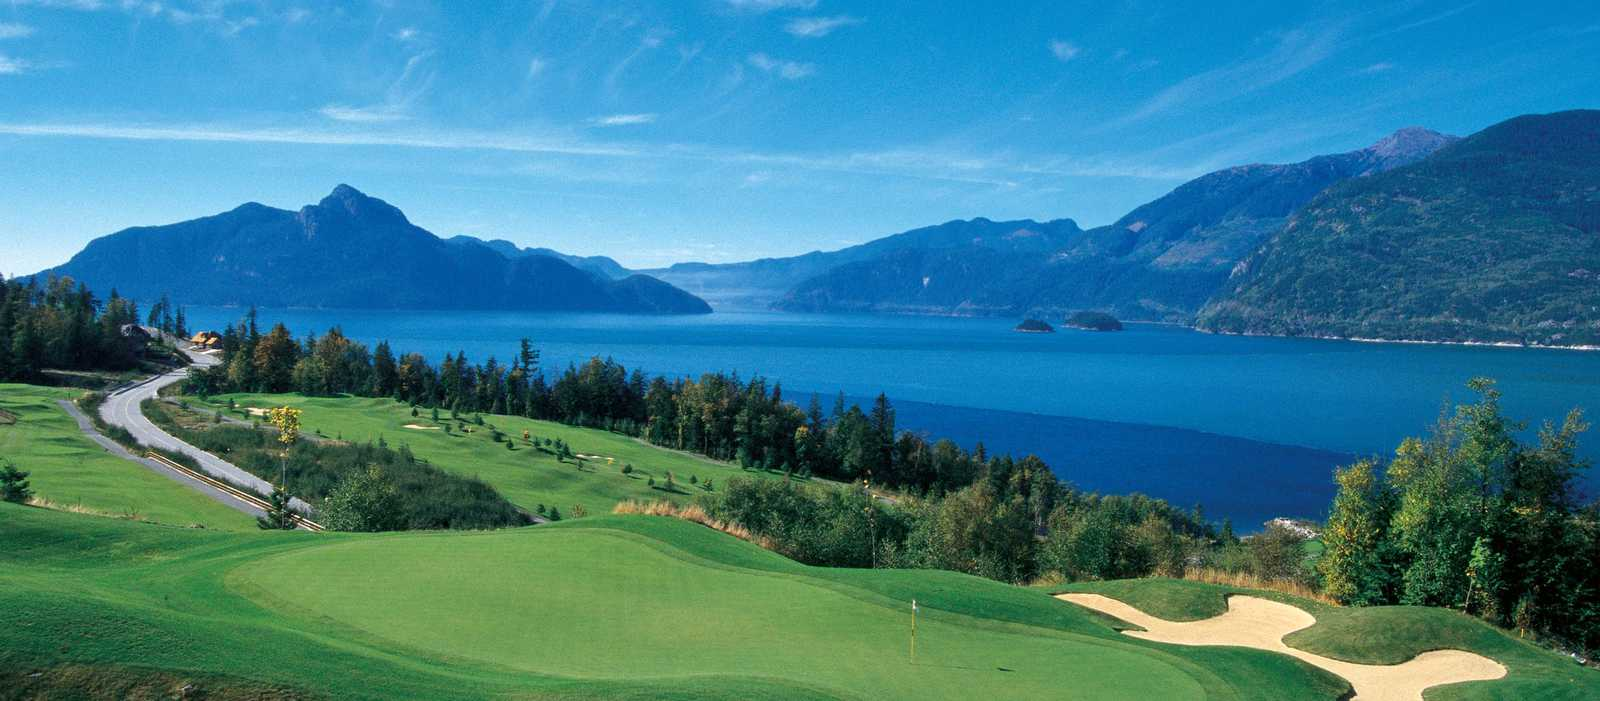 Furry Creek Golfplatz bei Vancouver